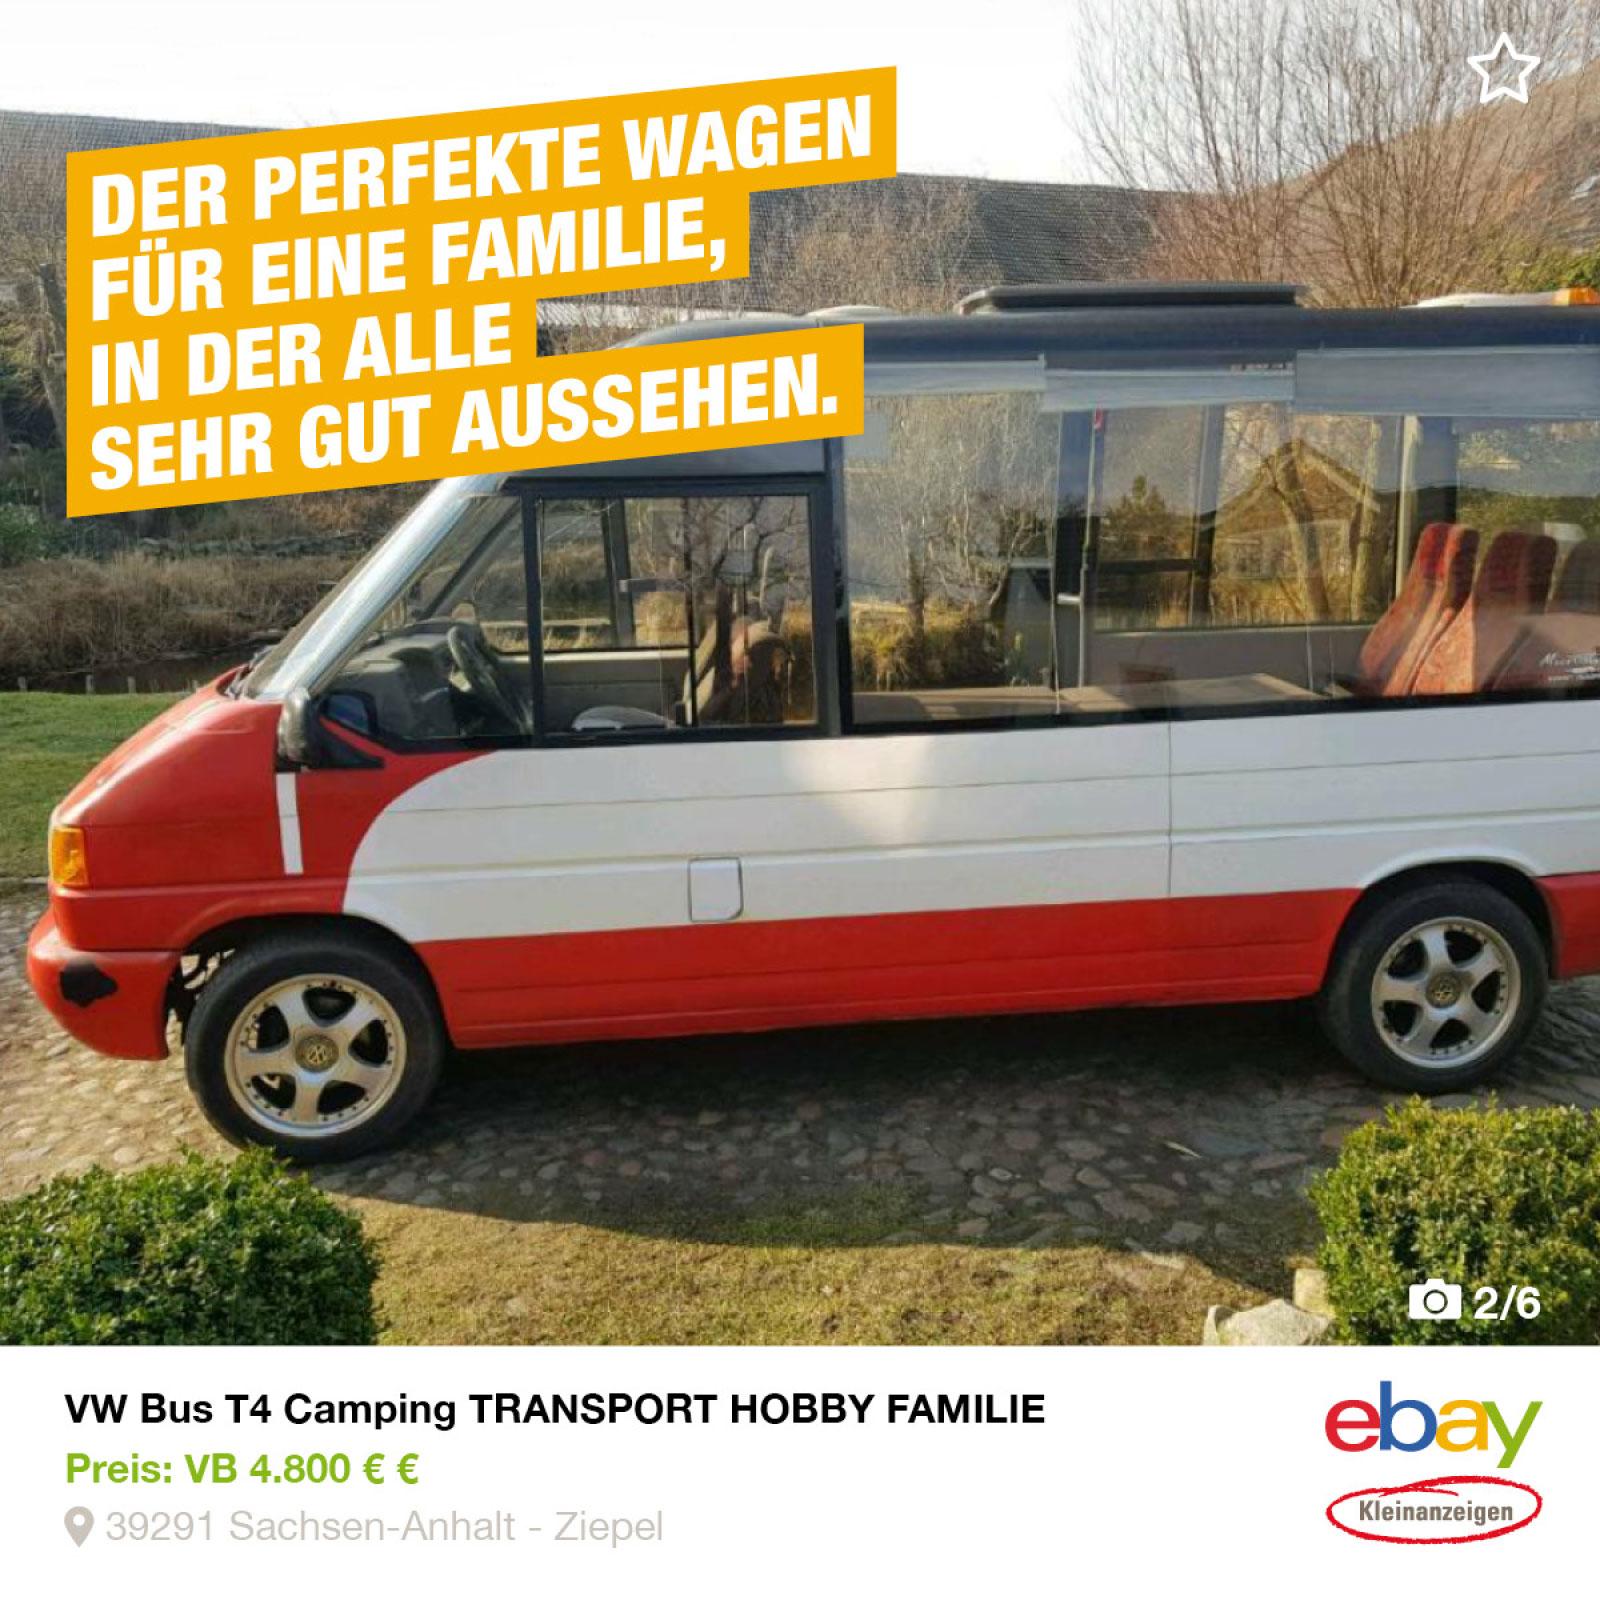 ebay_postings_14x14_rz_54